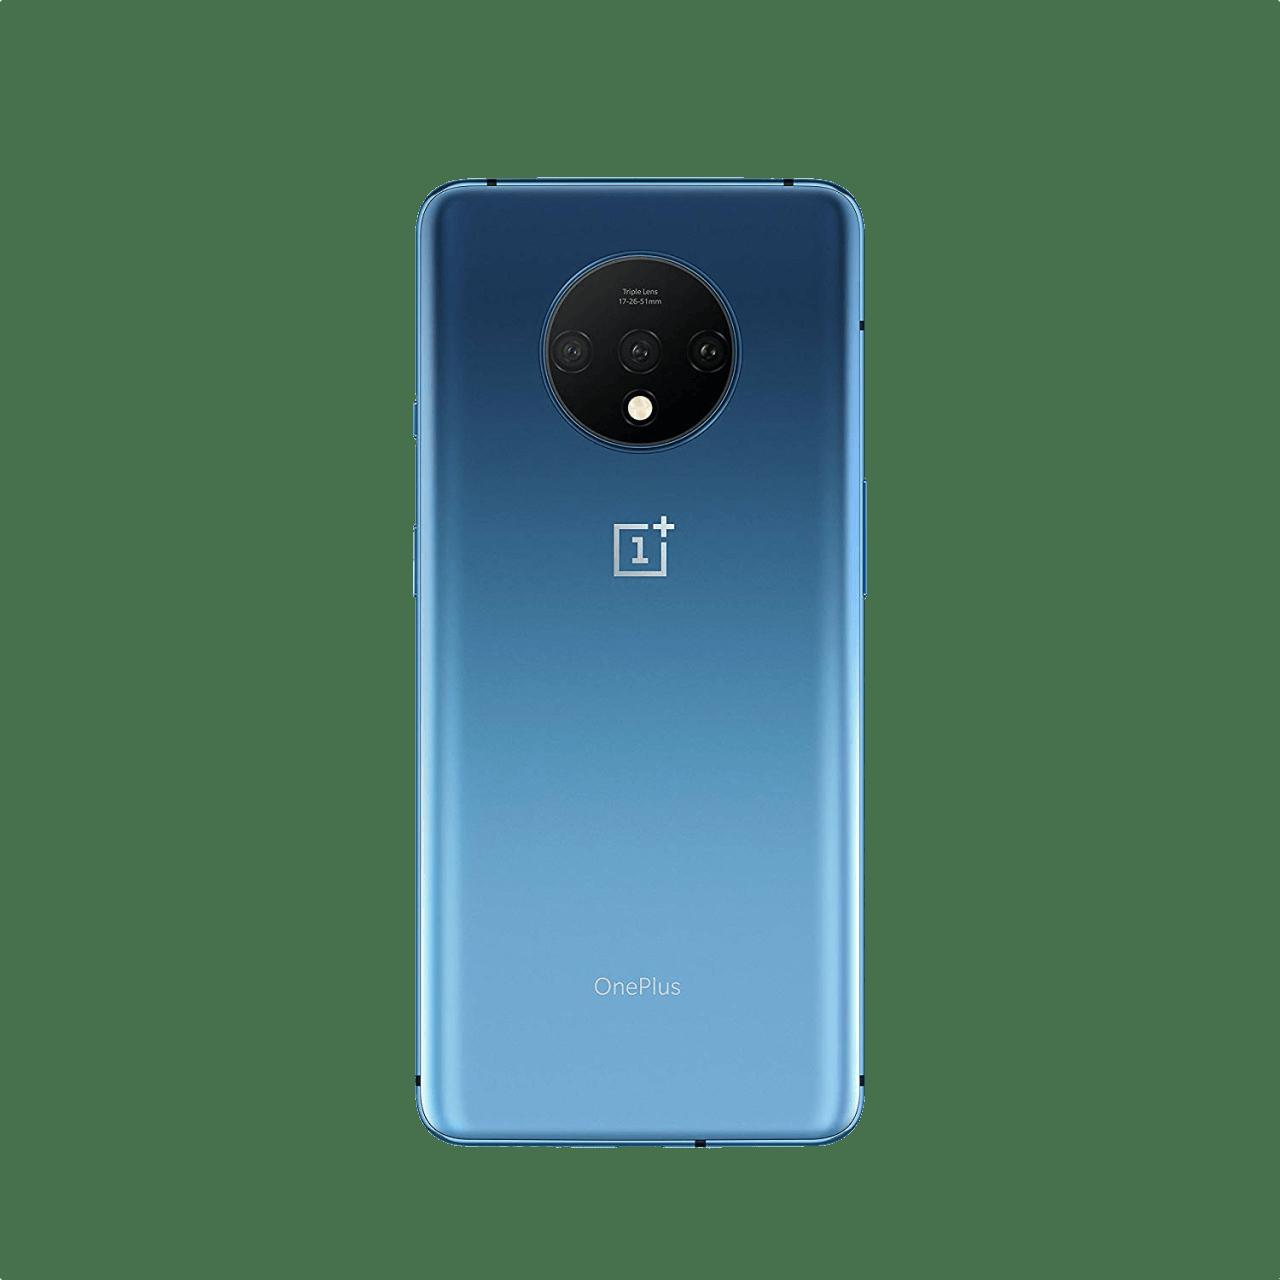 Glacier Blue OnePlus 7T 128GB.2